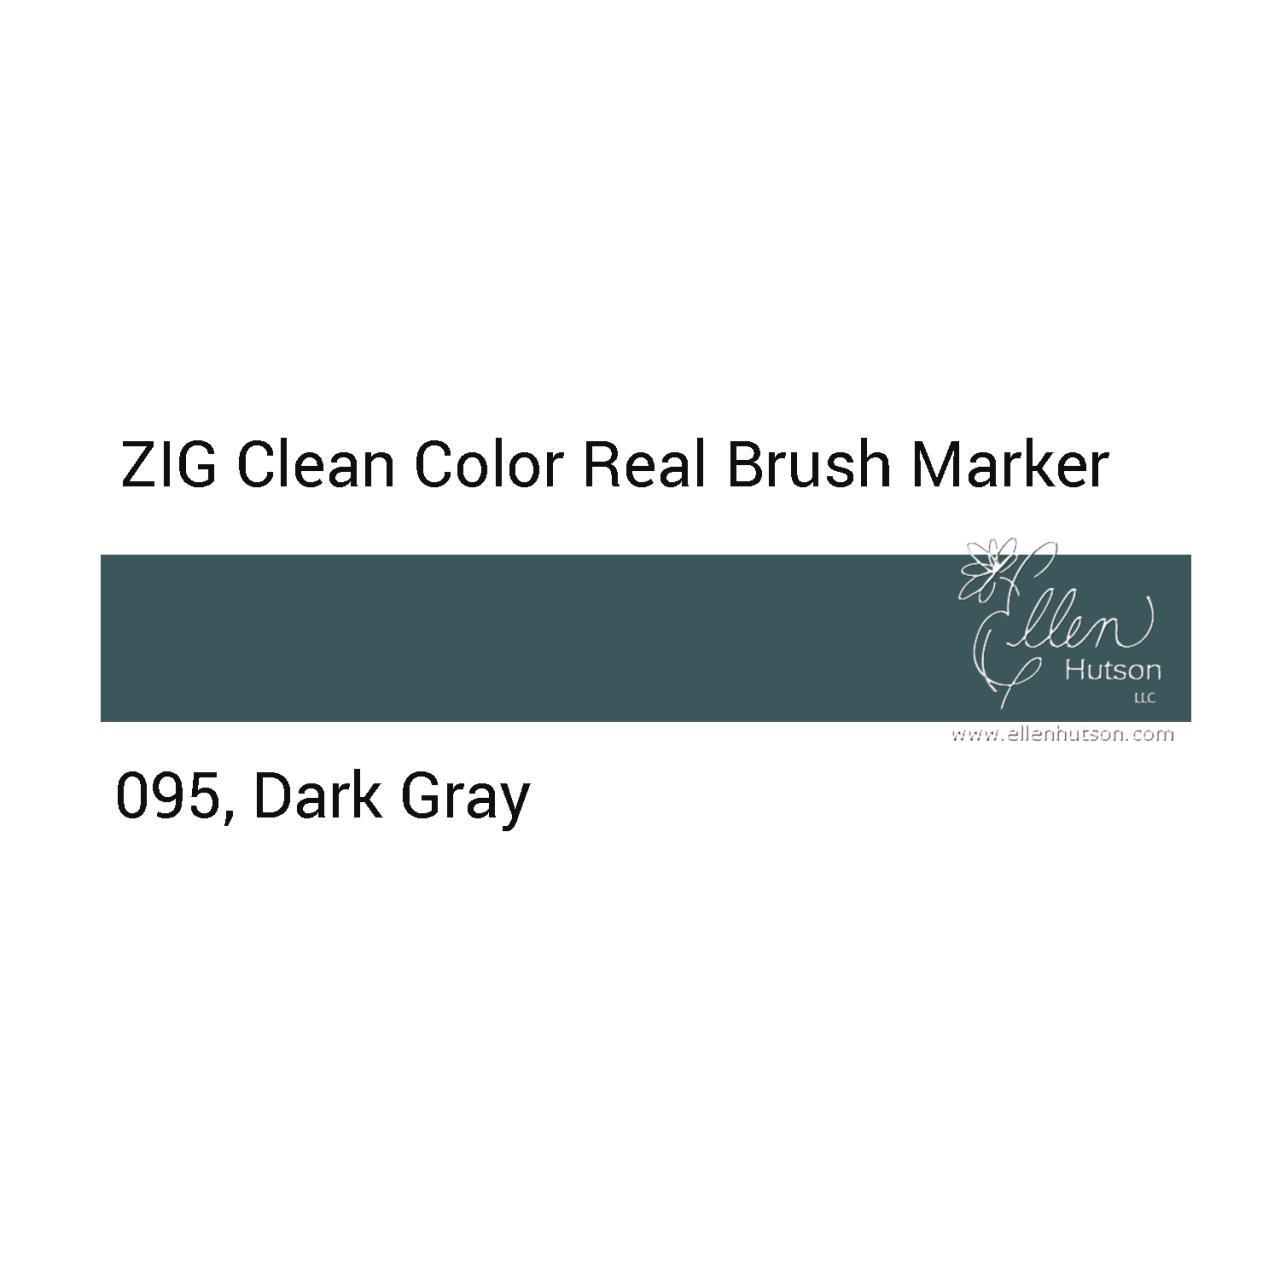 095 - Dark Gray, ZIG Clean Color Real Brush Marker -